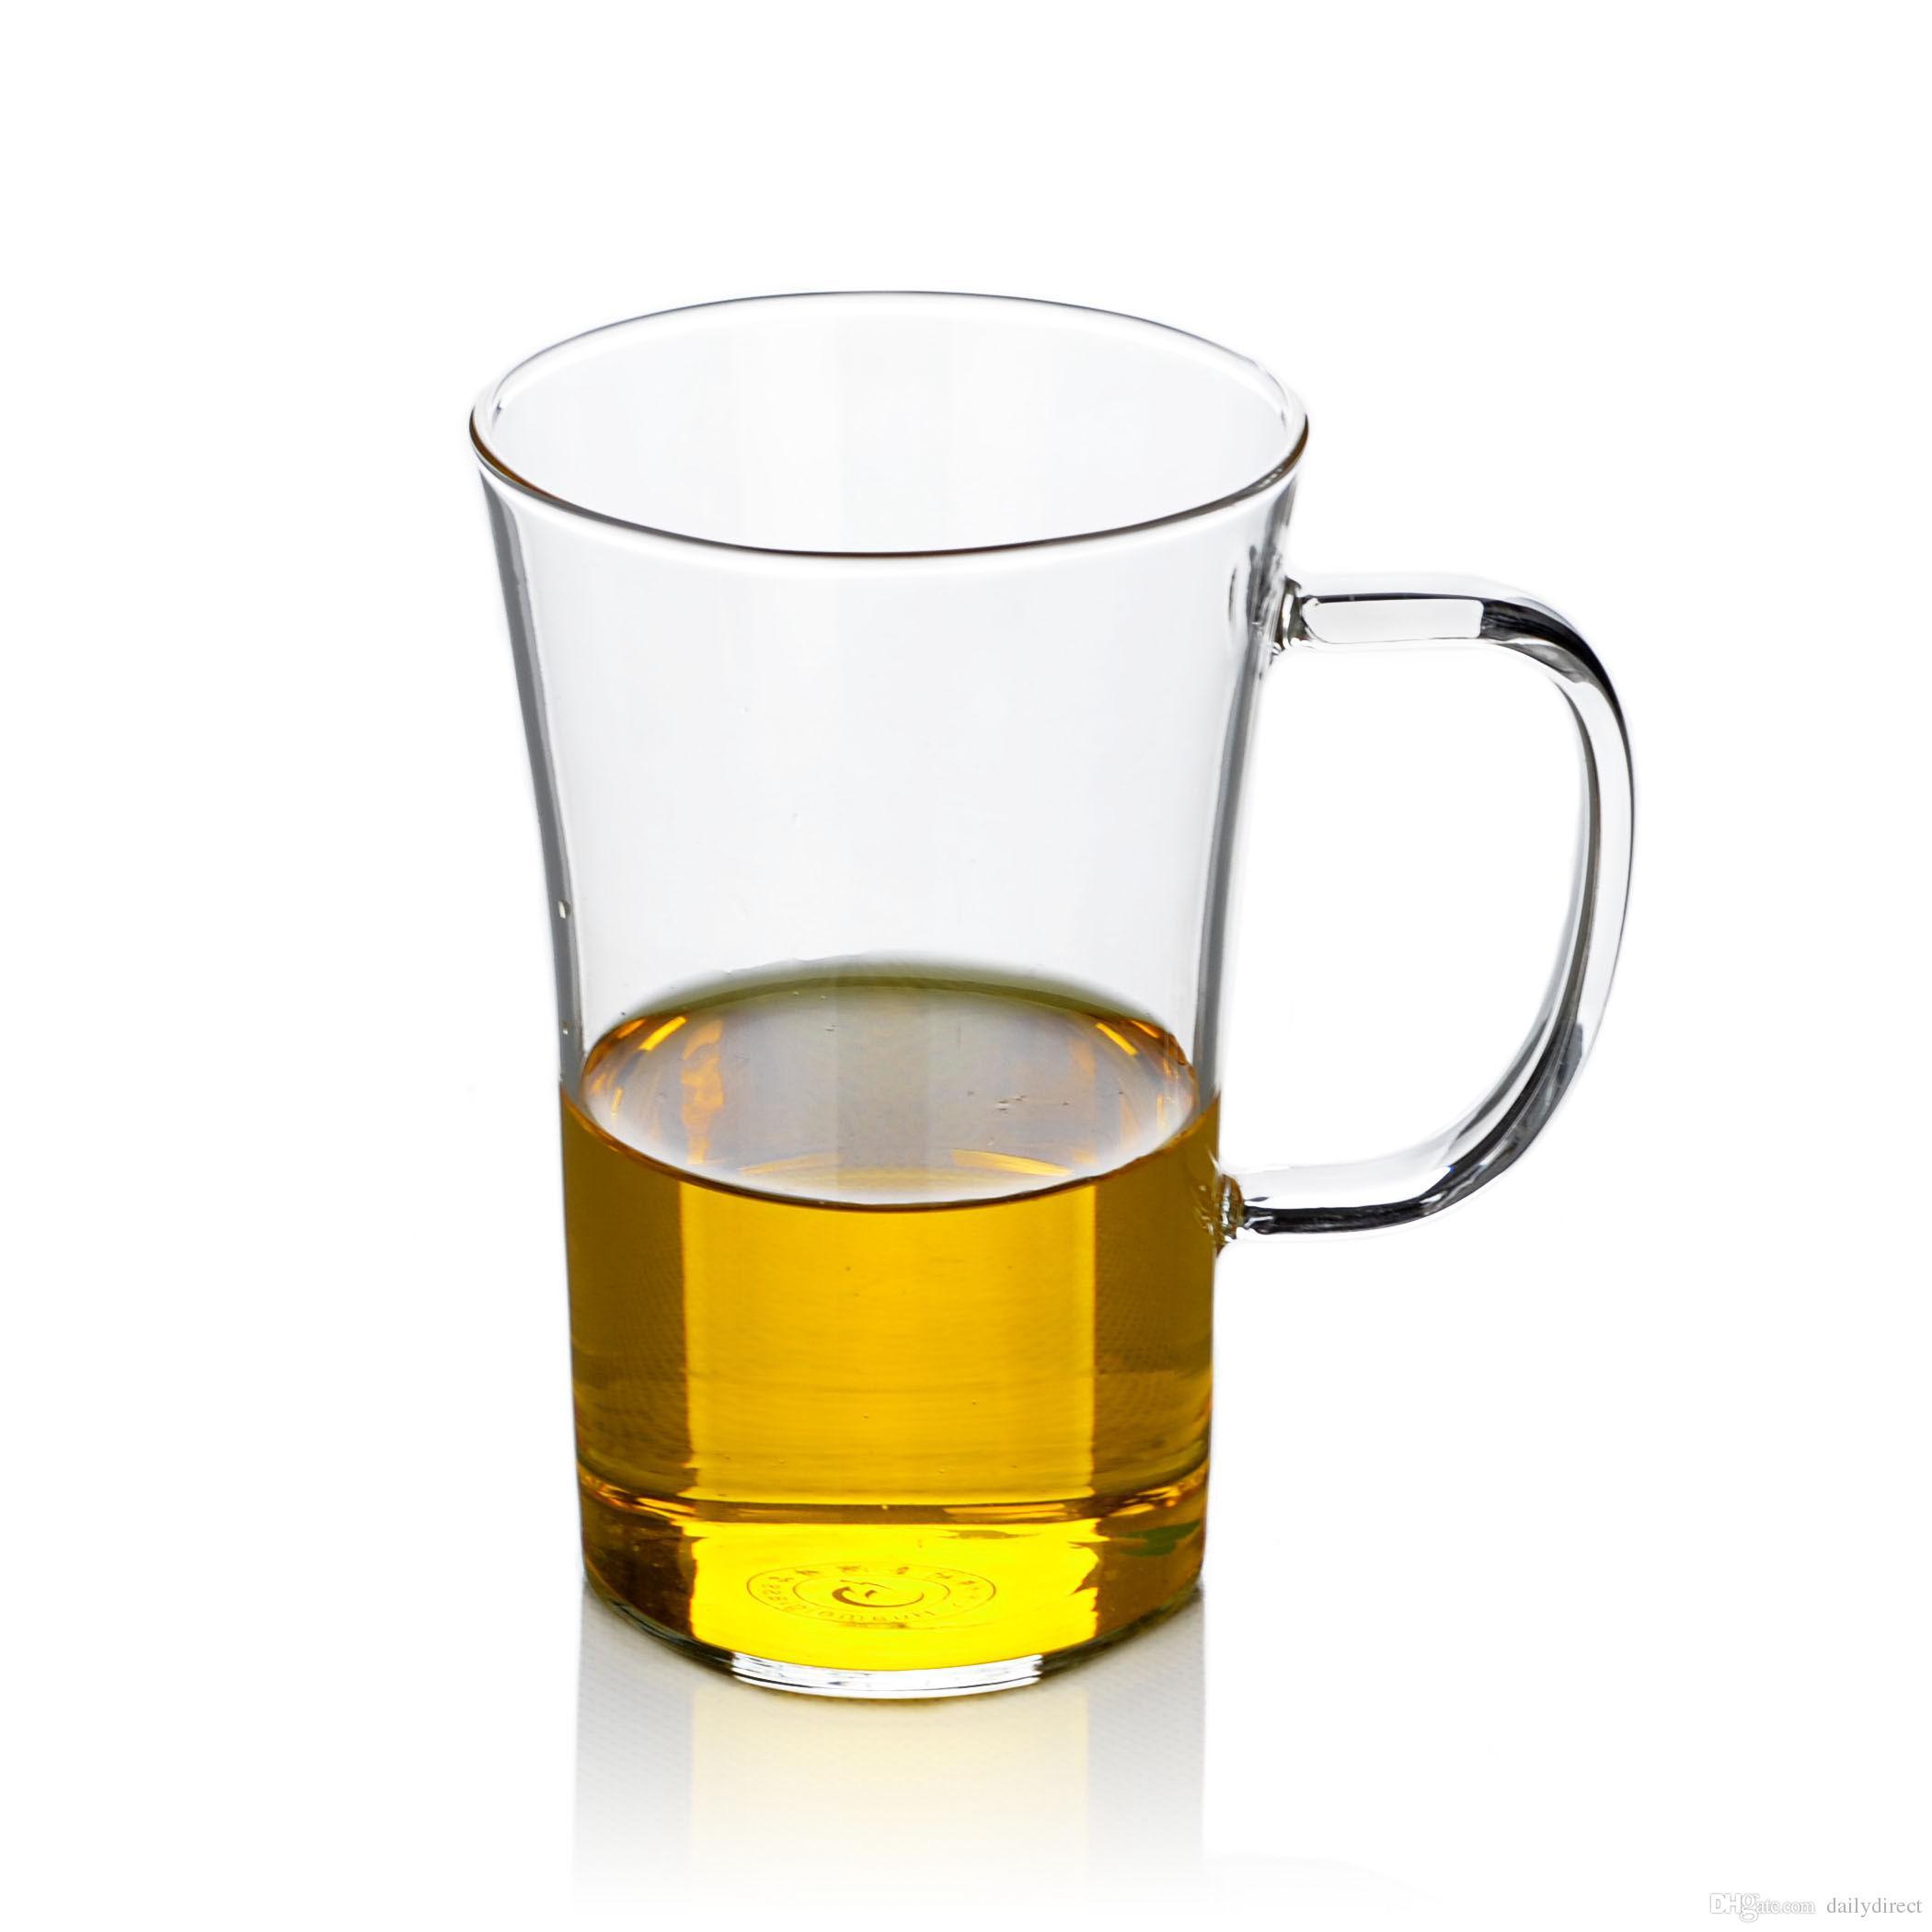 Lots Heat Resistant Glass Flared Tea Cup Mug for Flower Green Tea 330ml/11  fl oz Drop Shipping